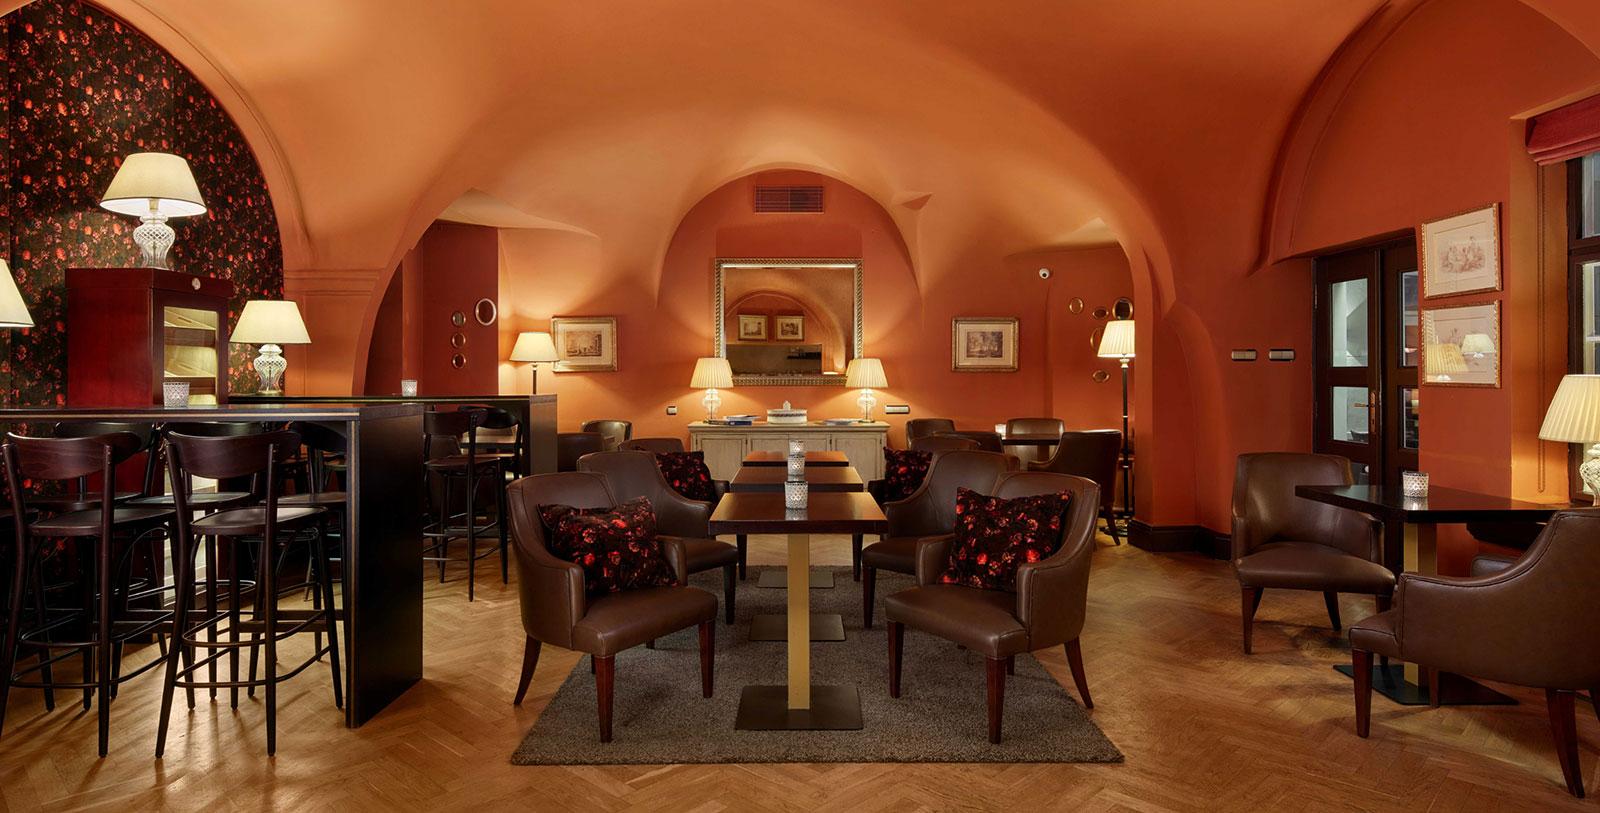 Image of Chapel Room Cigar Bar, The Mozart Prague, 1770, Member of Historic Hotels Worldwide, Prague, Czech Republic, Request For Proposal